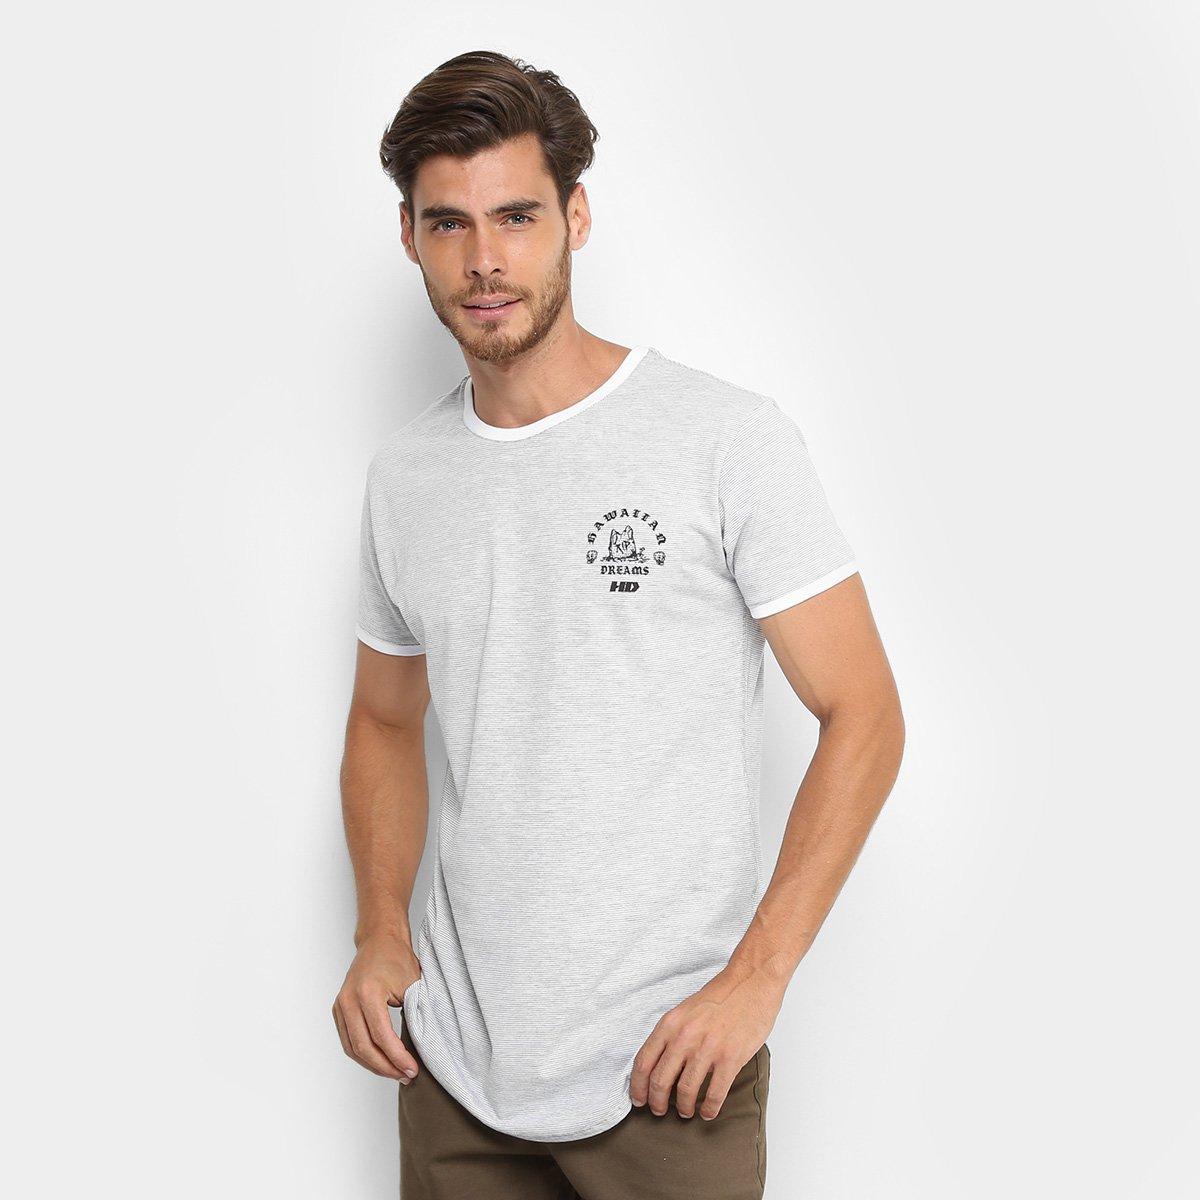 c4d7c266488d7 Camiseta Longline HD Especial Masculina - Branco - Compre Agora ...